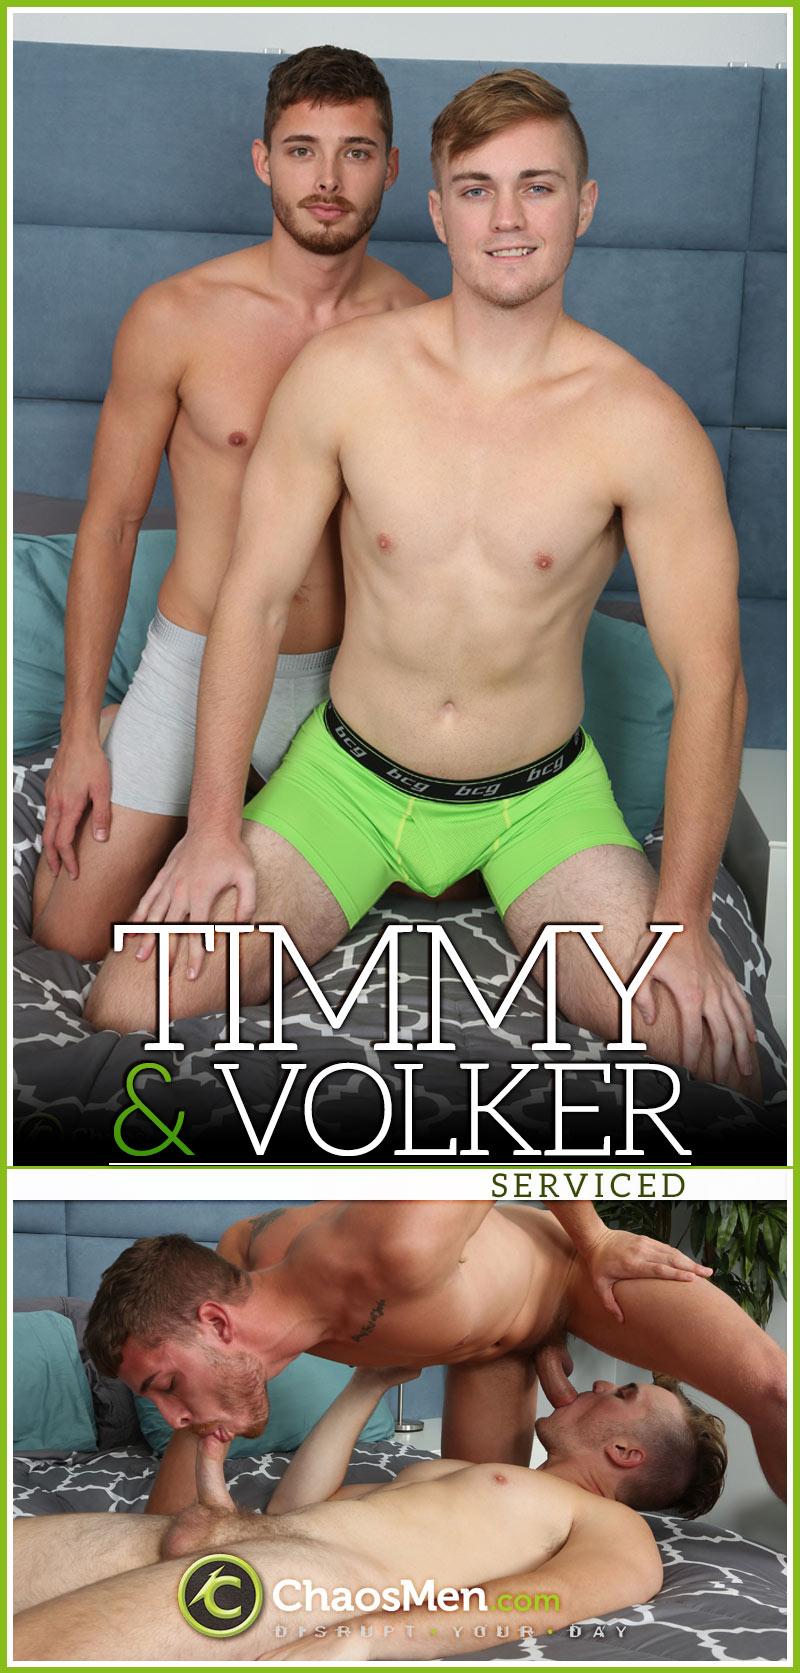 Timmy & Volker 'Serviced' at ChaosMen